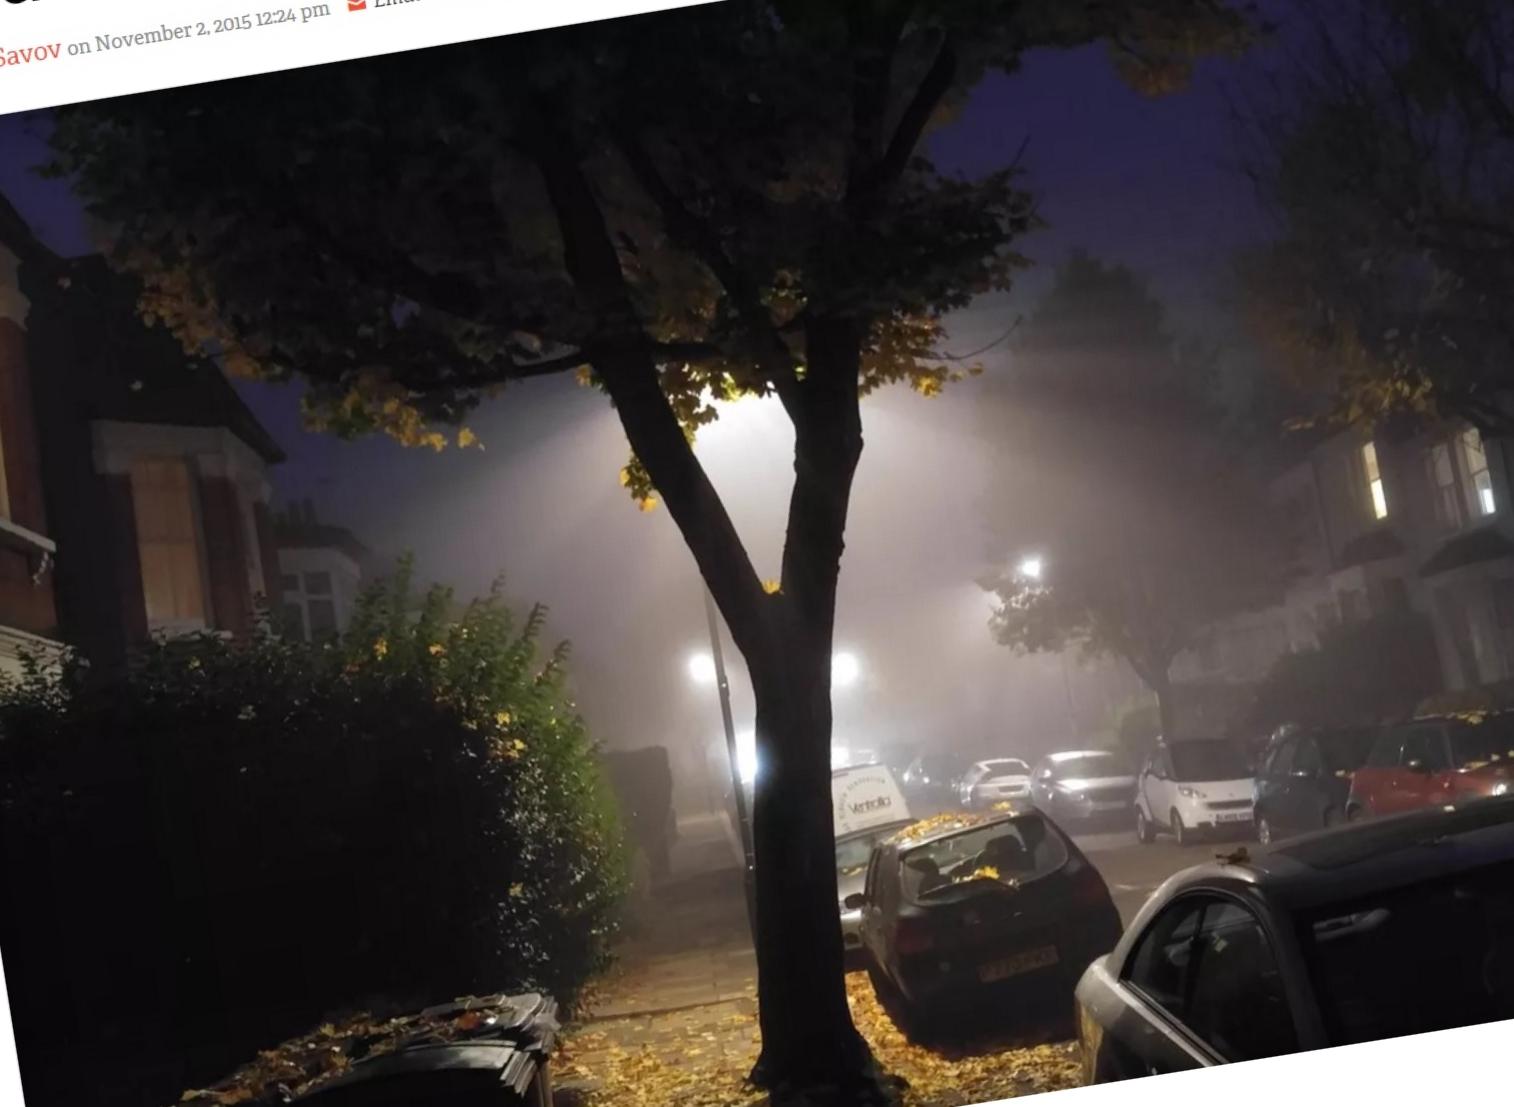 LG V10 tar svært imponerende bilder selv når det er dårlig med lys.